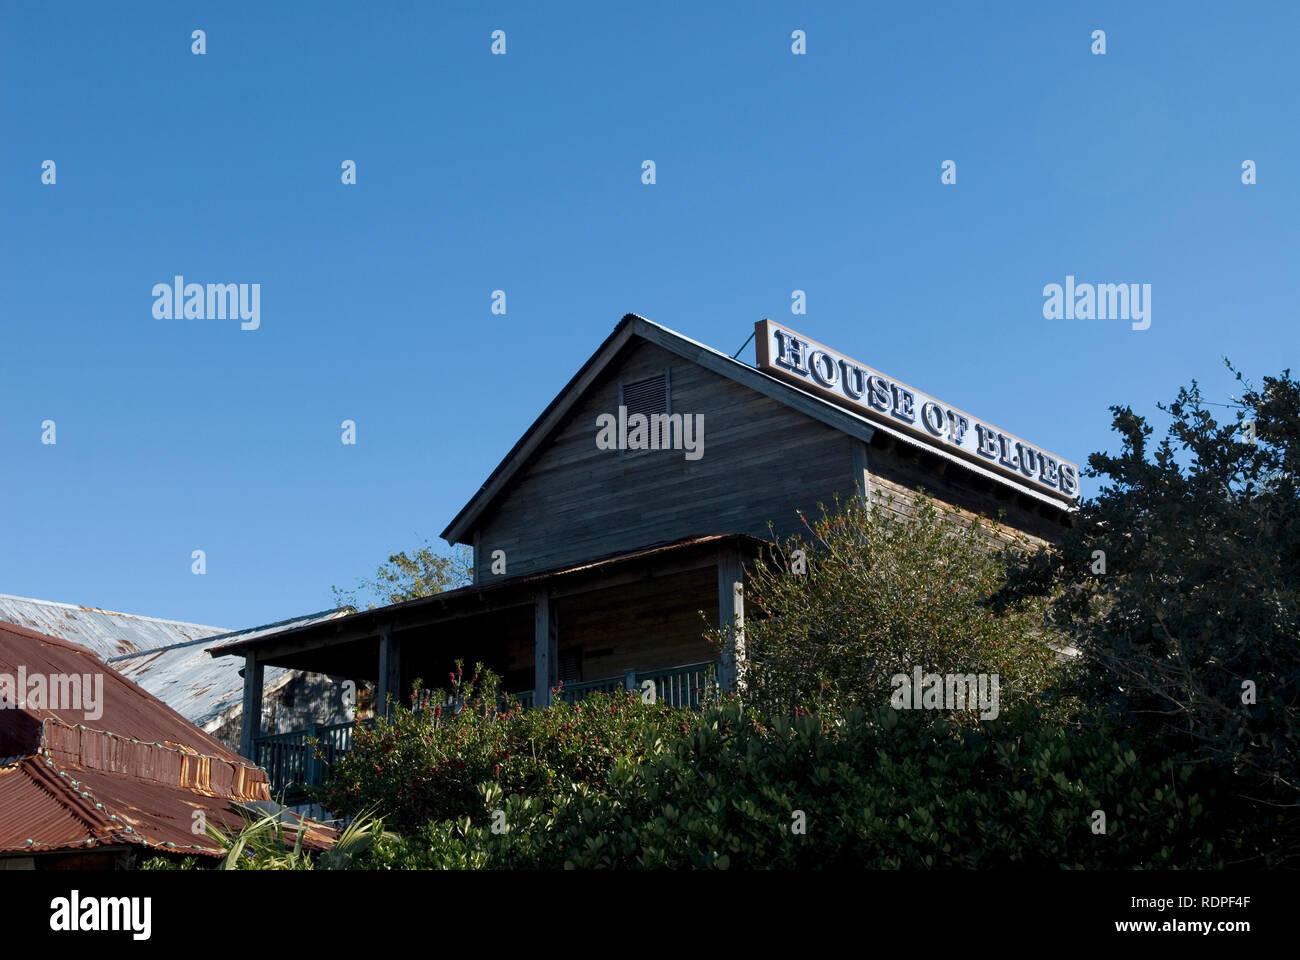 House of Blues at Myrtle Beach South Carolina, USA. - Stock Image